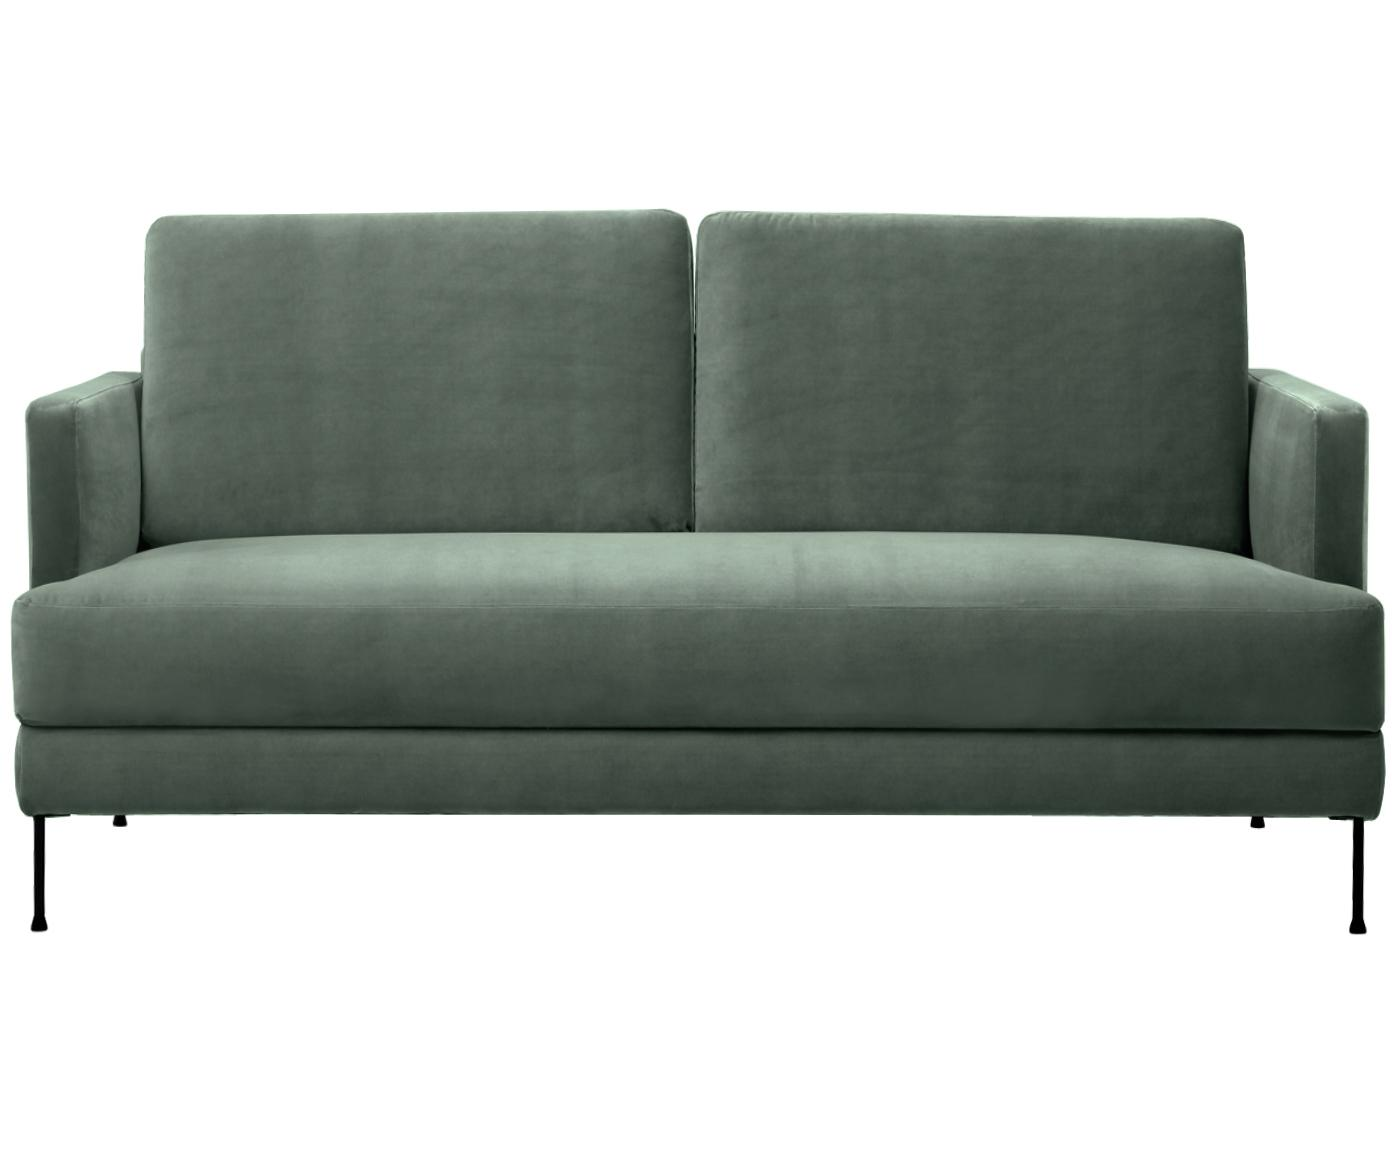 Samt-Sofa Fluente (2-Sitzer), Bezug: Samt (Hochwertiger Polyes, Gestell: Massives Kiefernholz, Samt Grün, B 168 x T 83 cm